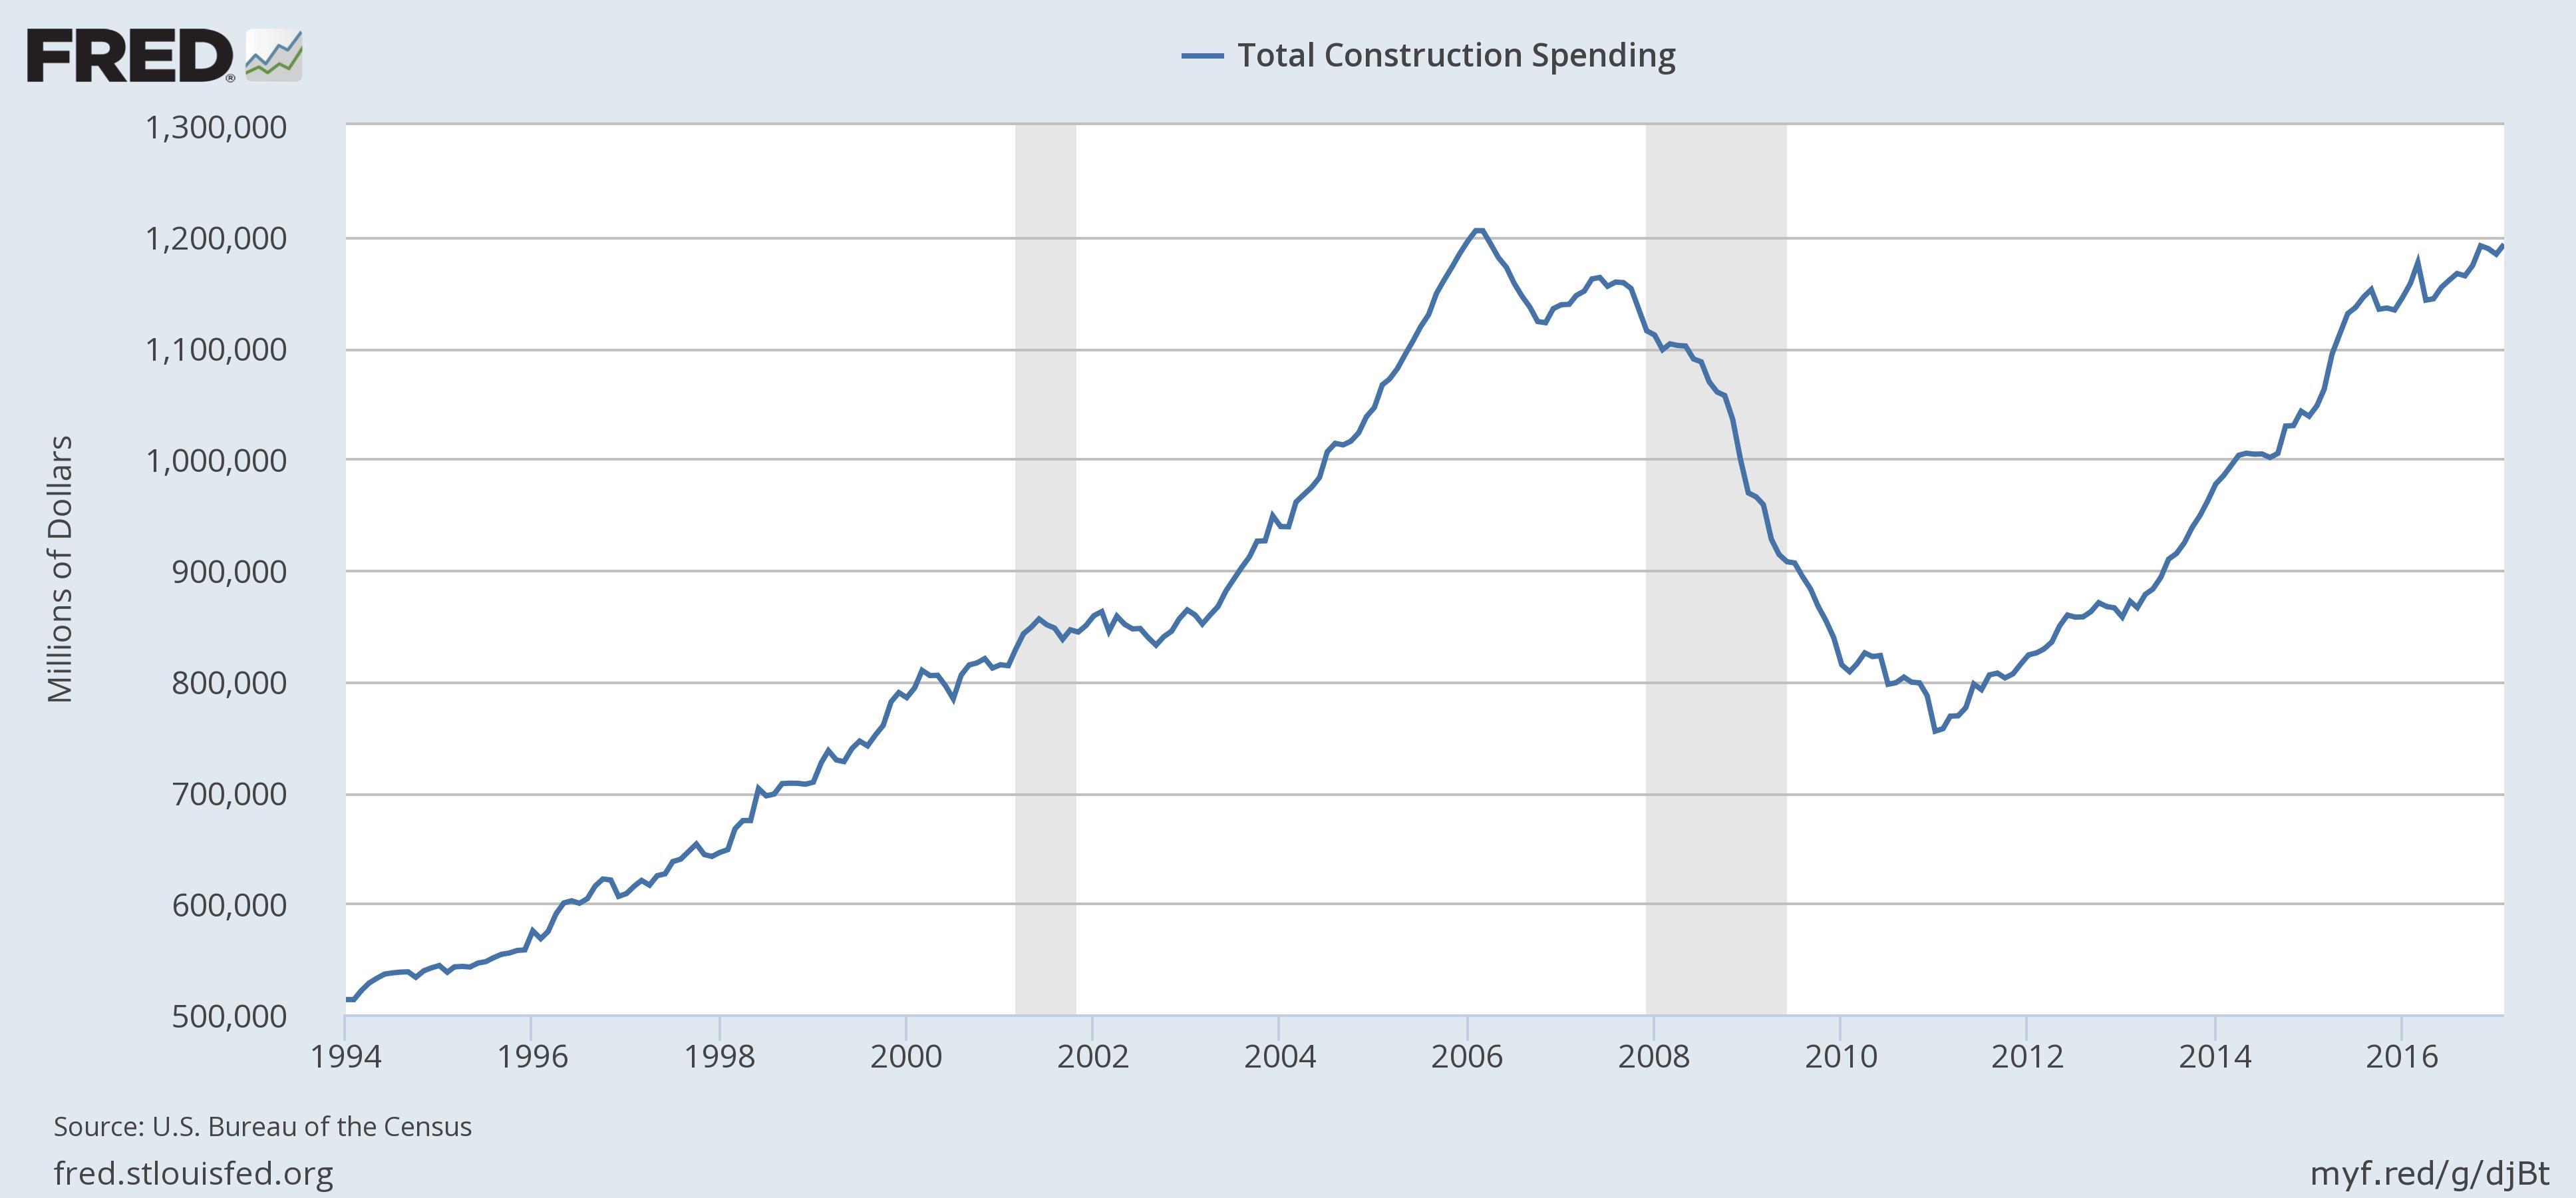 US Construction Spending, 1994 - 2016